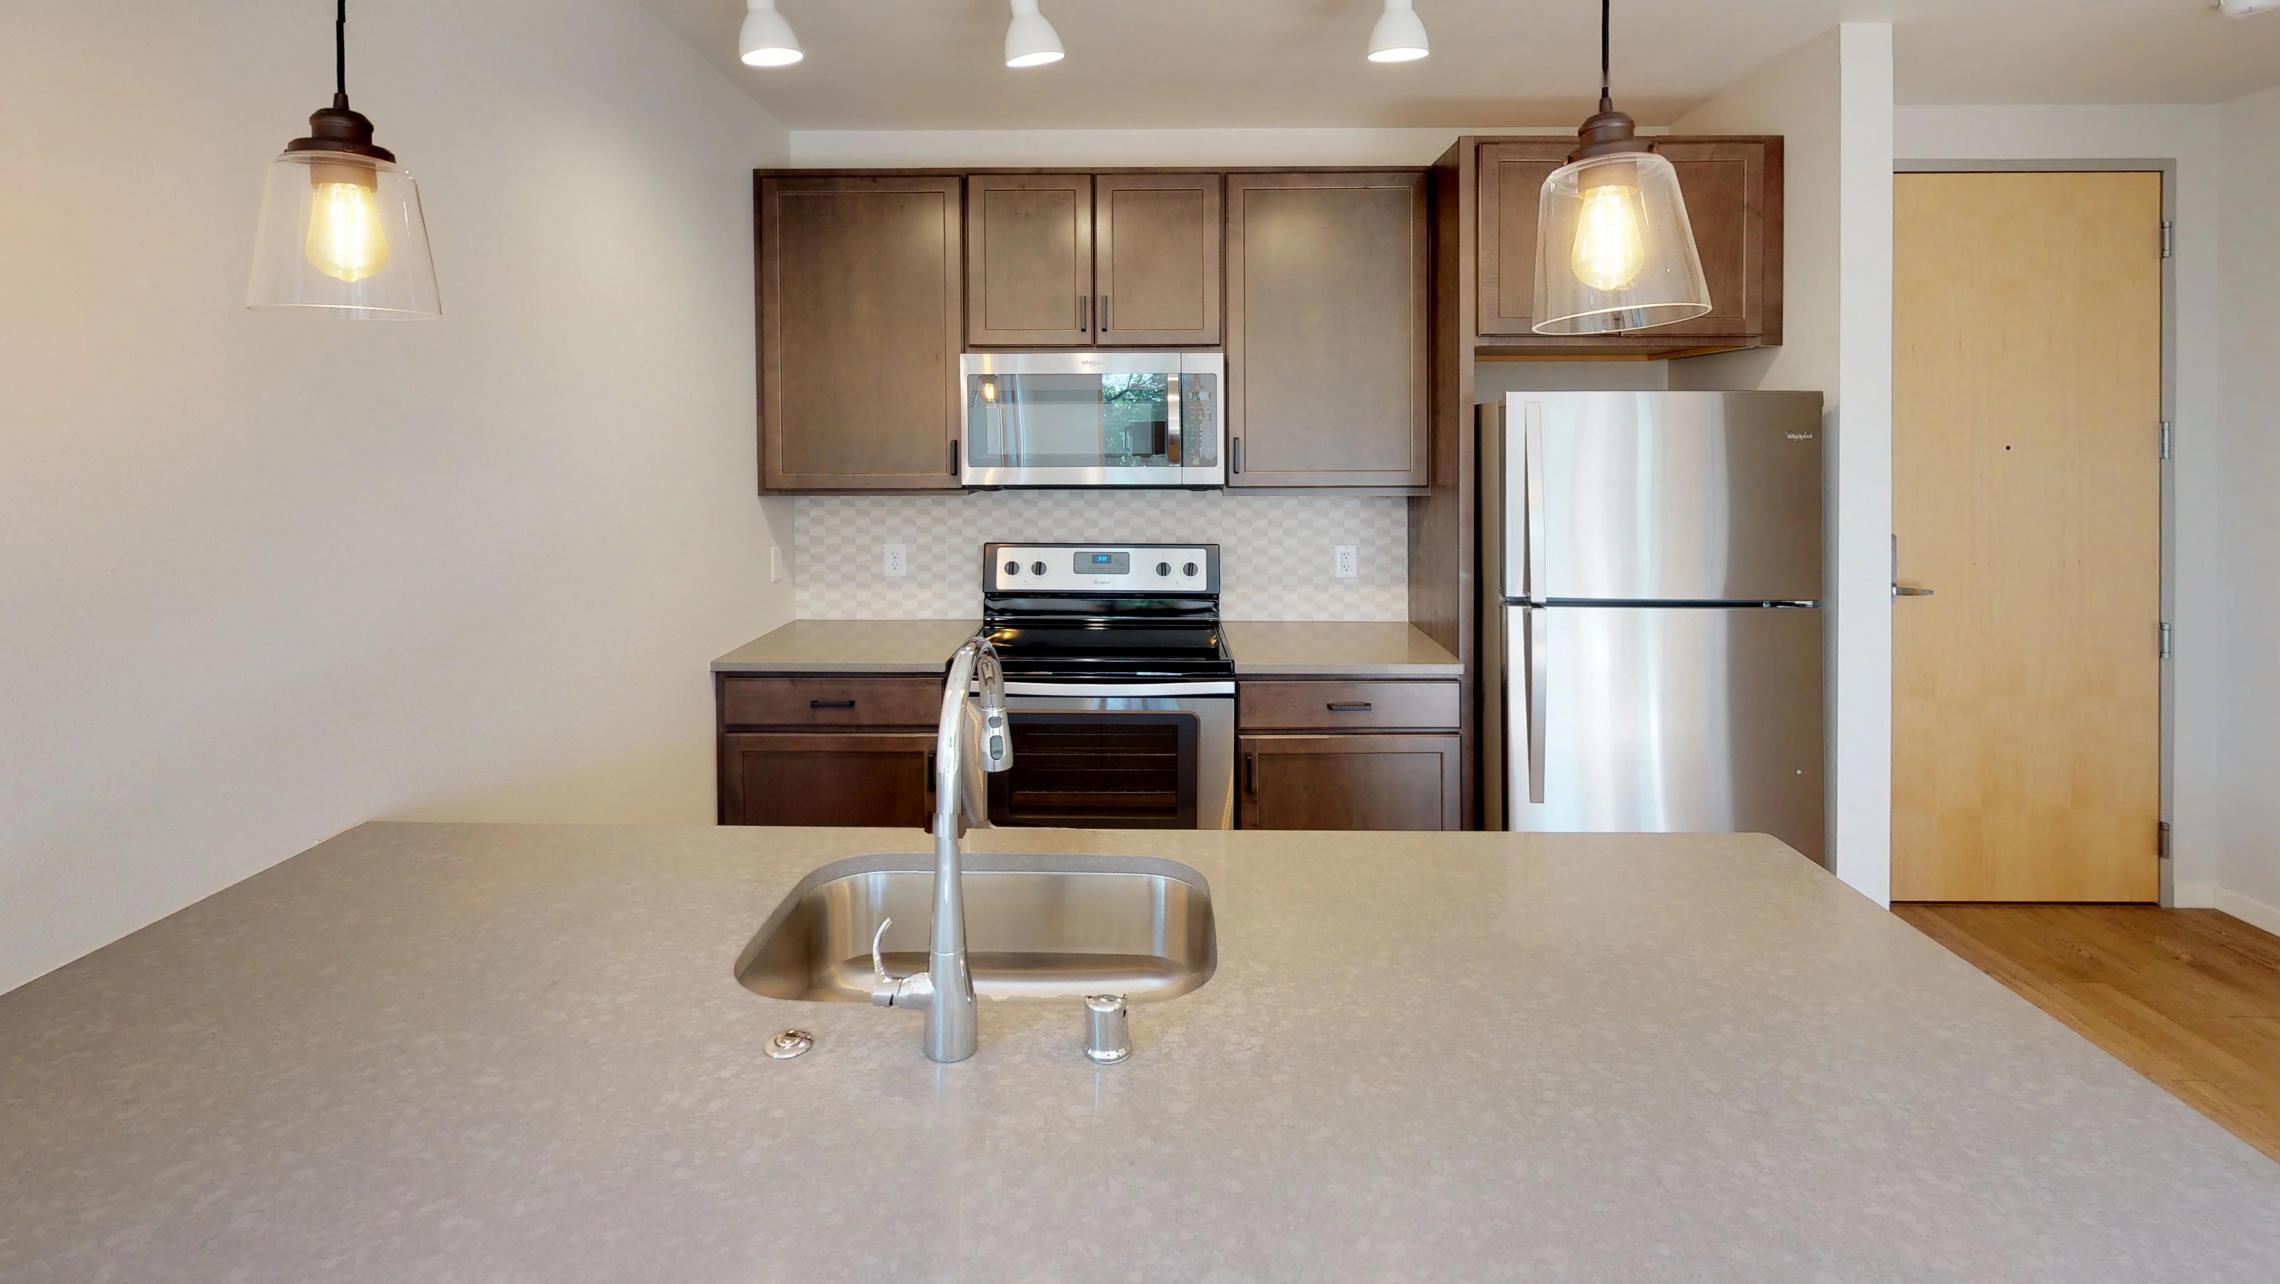 Quarter-Row-Yards-Apartment-226-Corner-Windows-One-Bedroom-Modern-Upscale-Fitness-Lounge-Courtyard-Downtown-Madison-Balcony-Amenities-Luxury